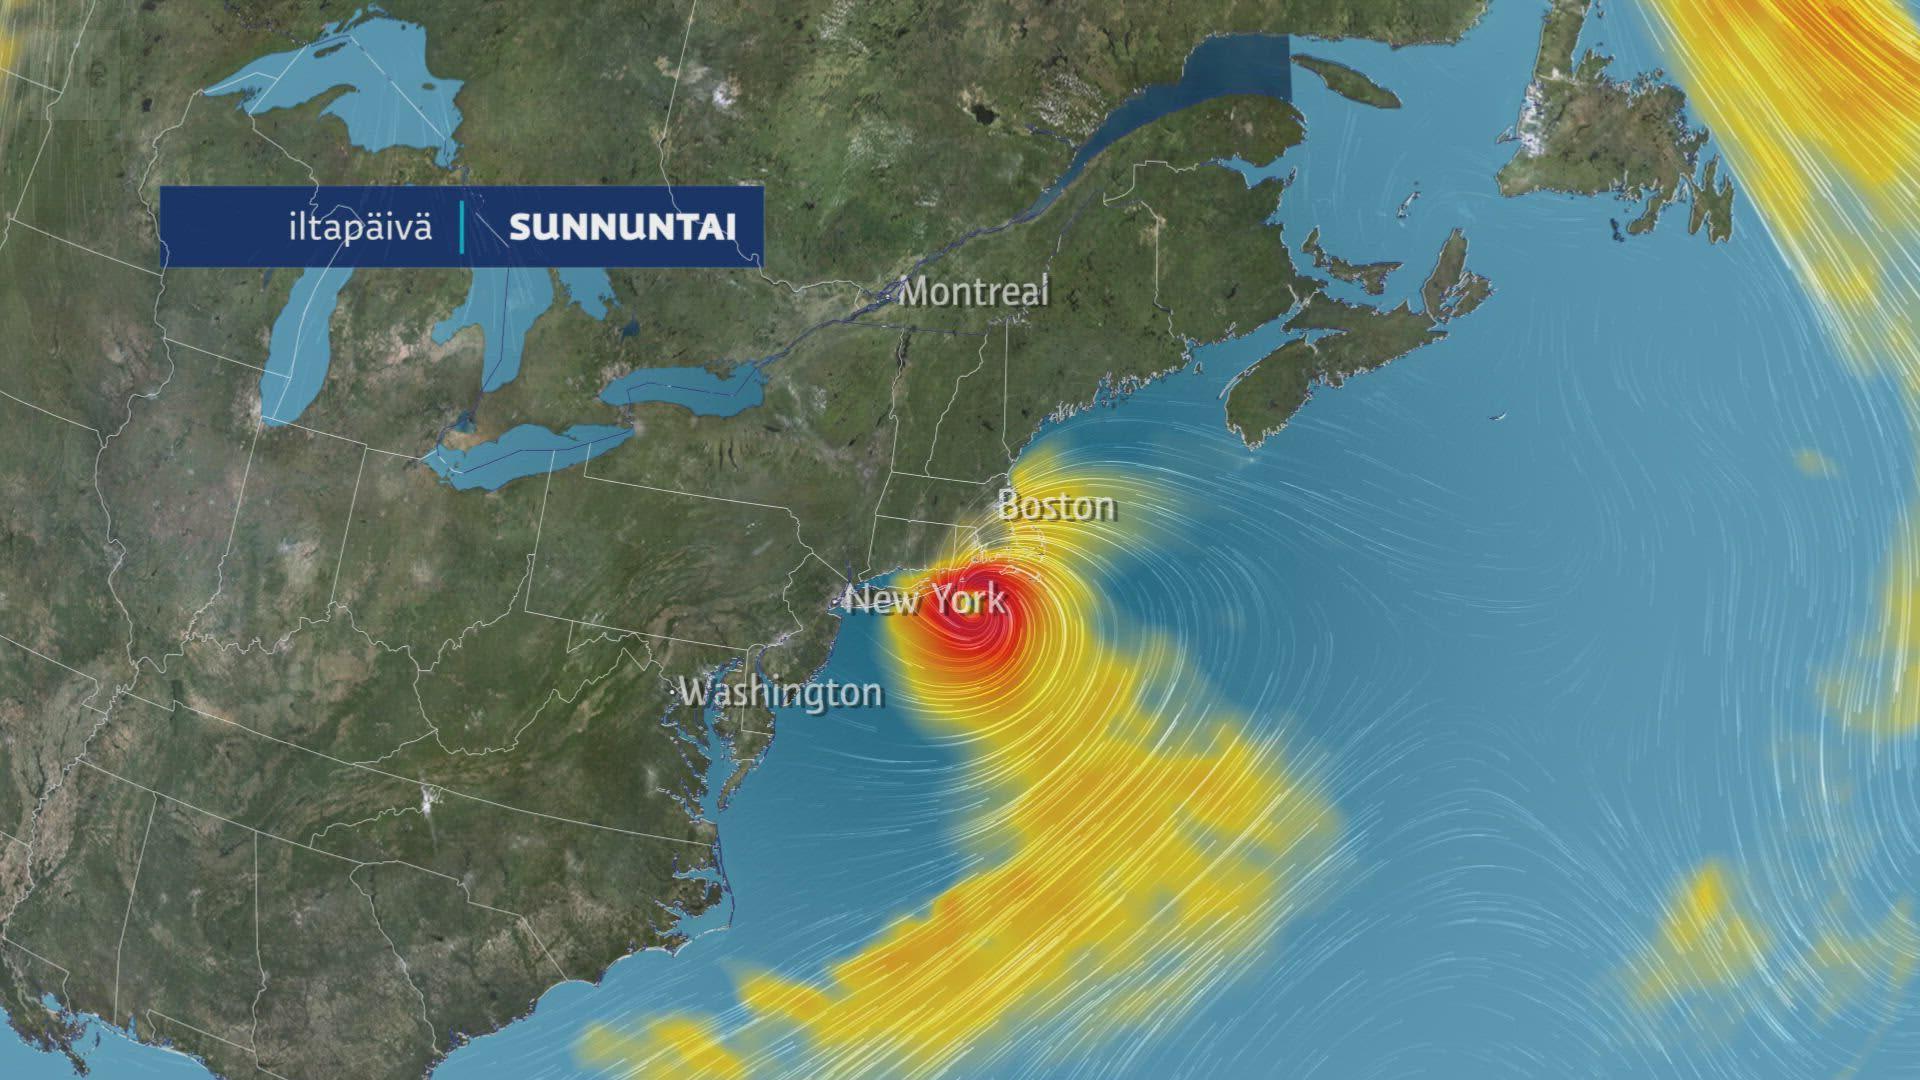 Henri-myrsky rantautuu Yhdysvaltoihin